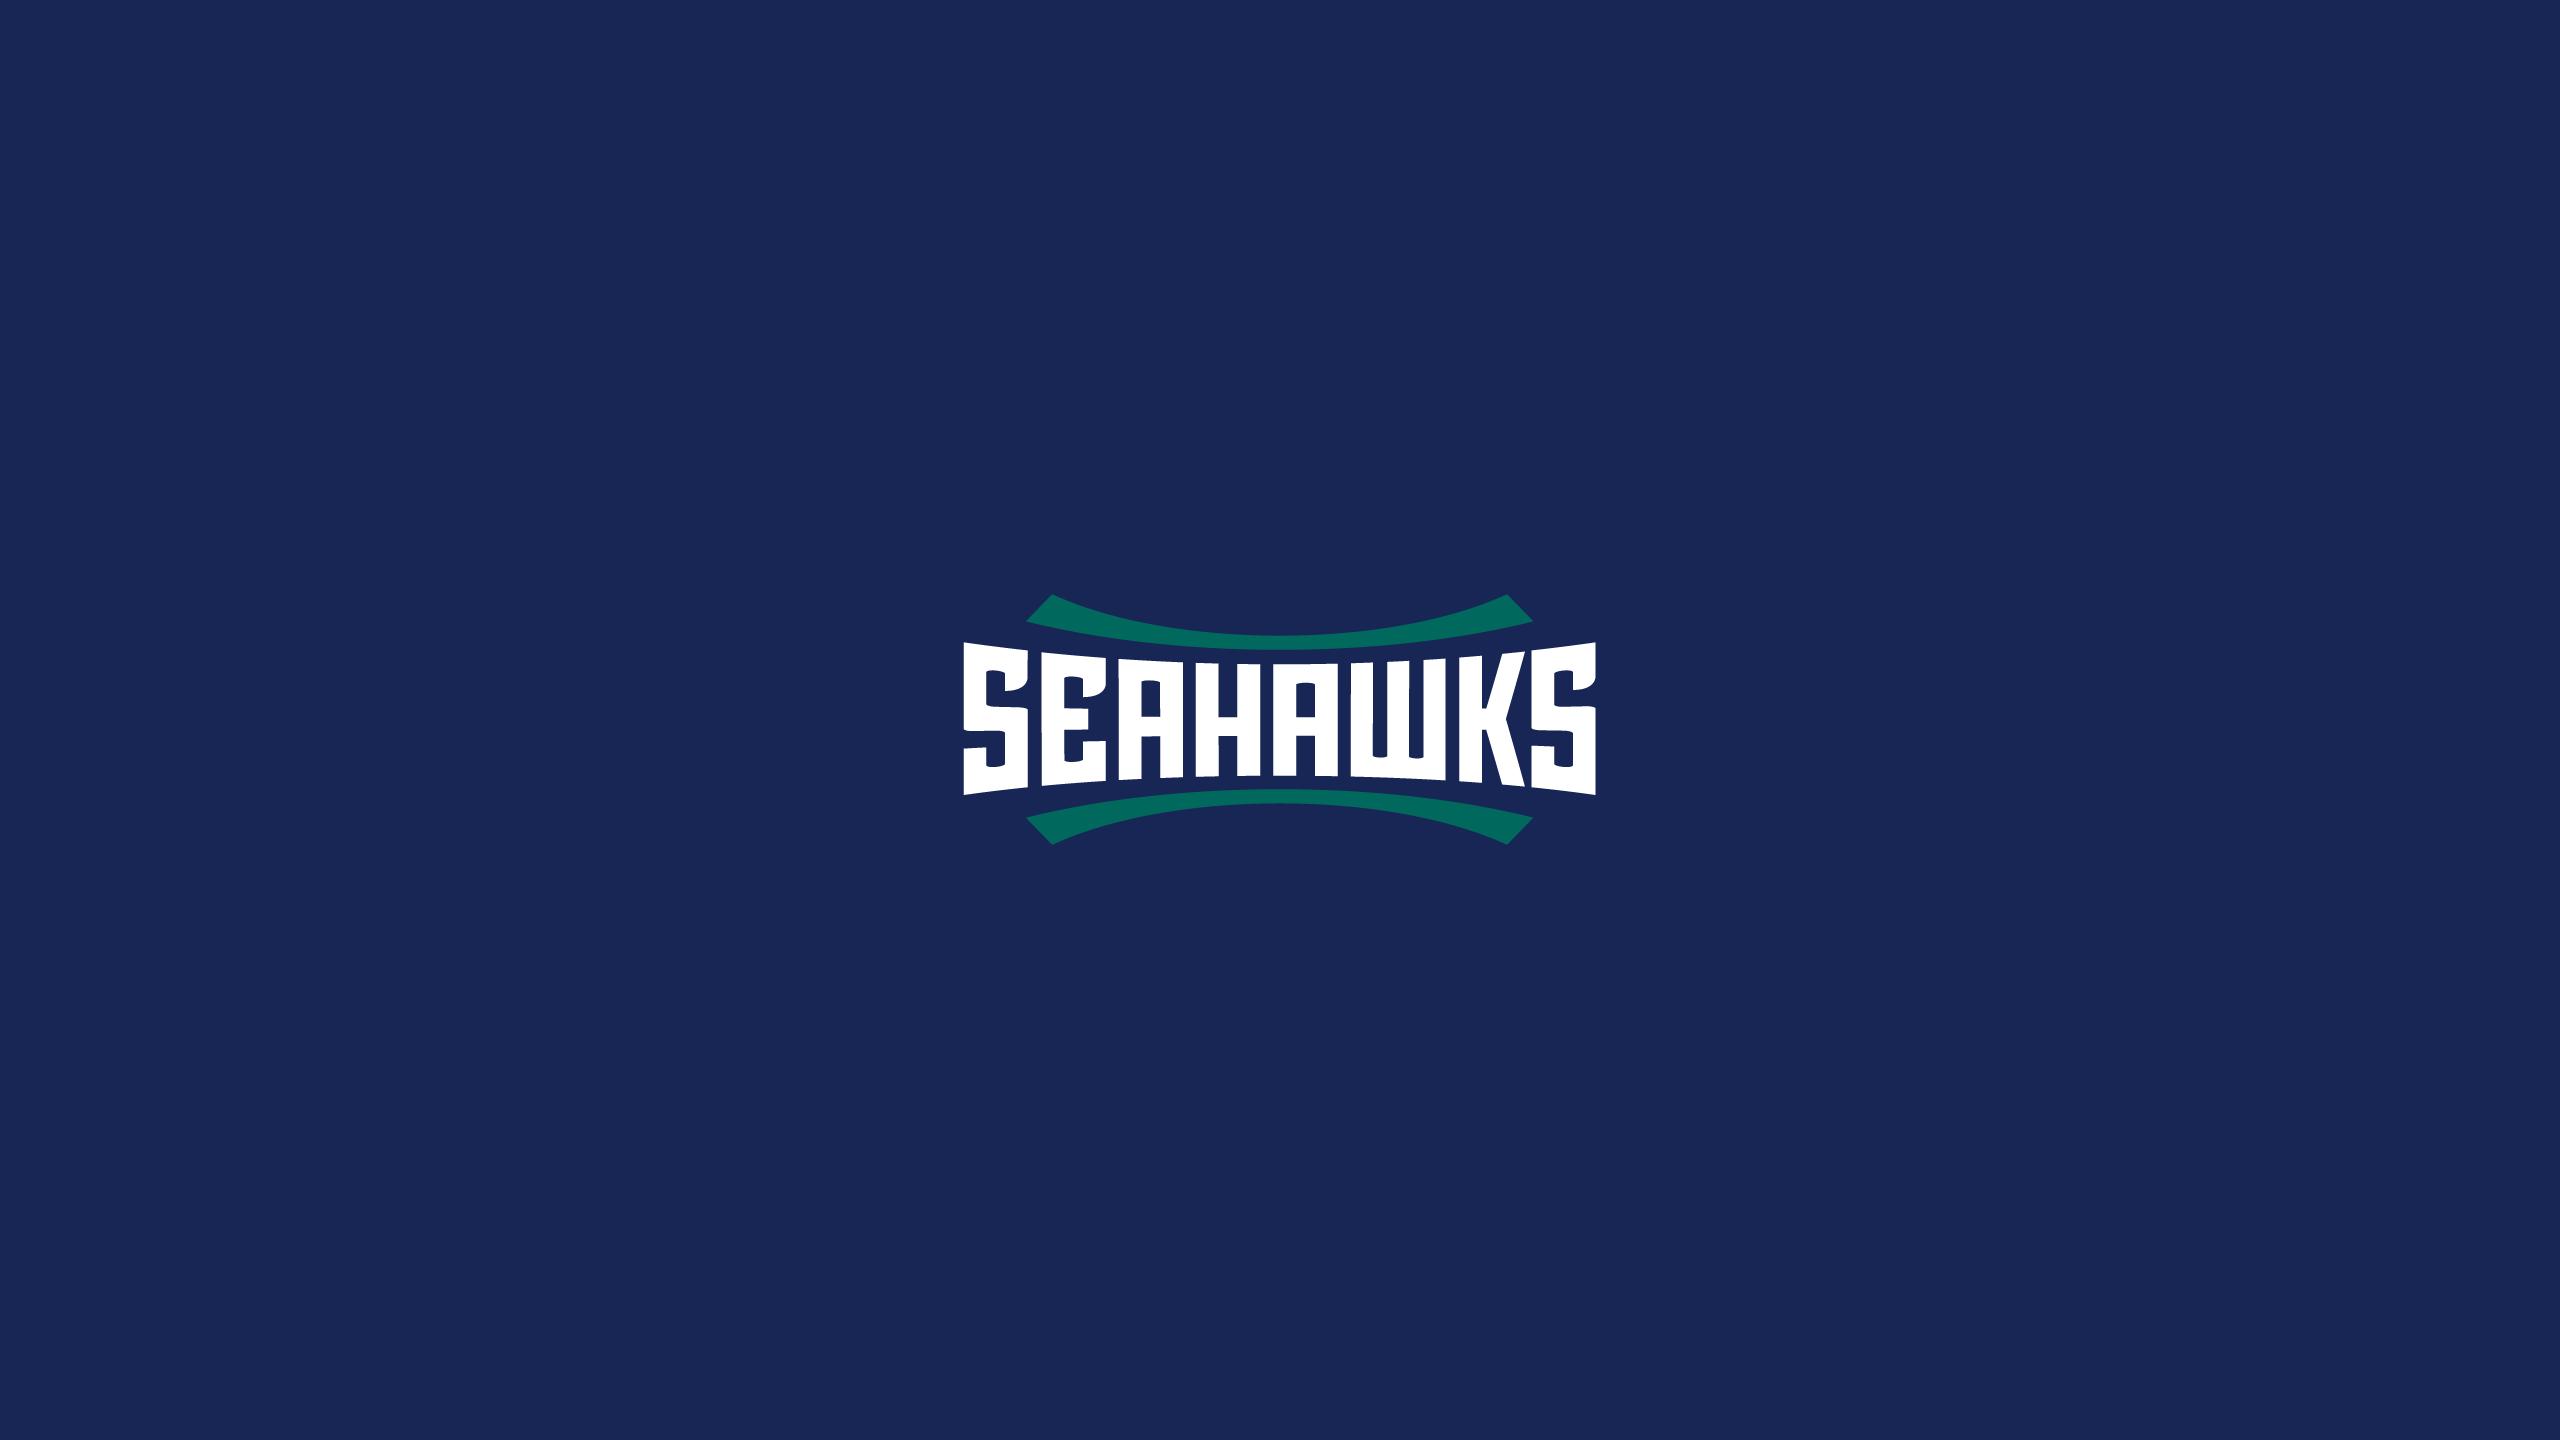 University of North Carolina-Wilmington Seahawks